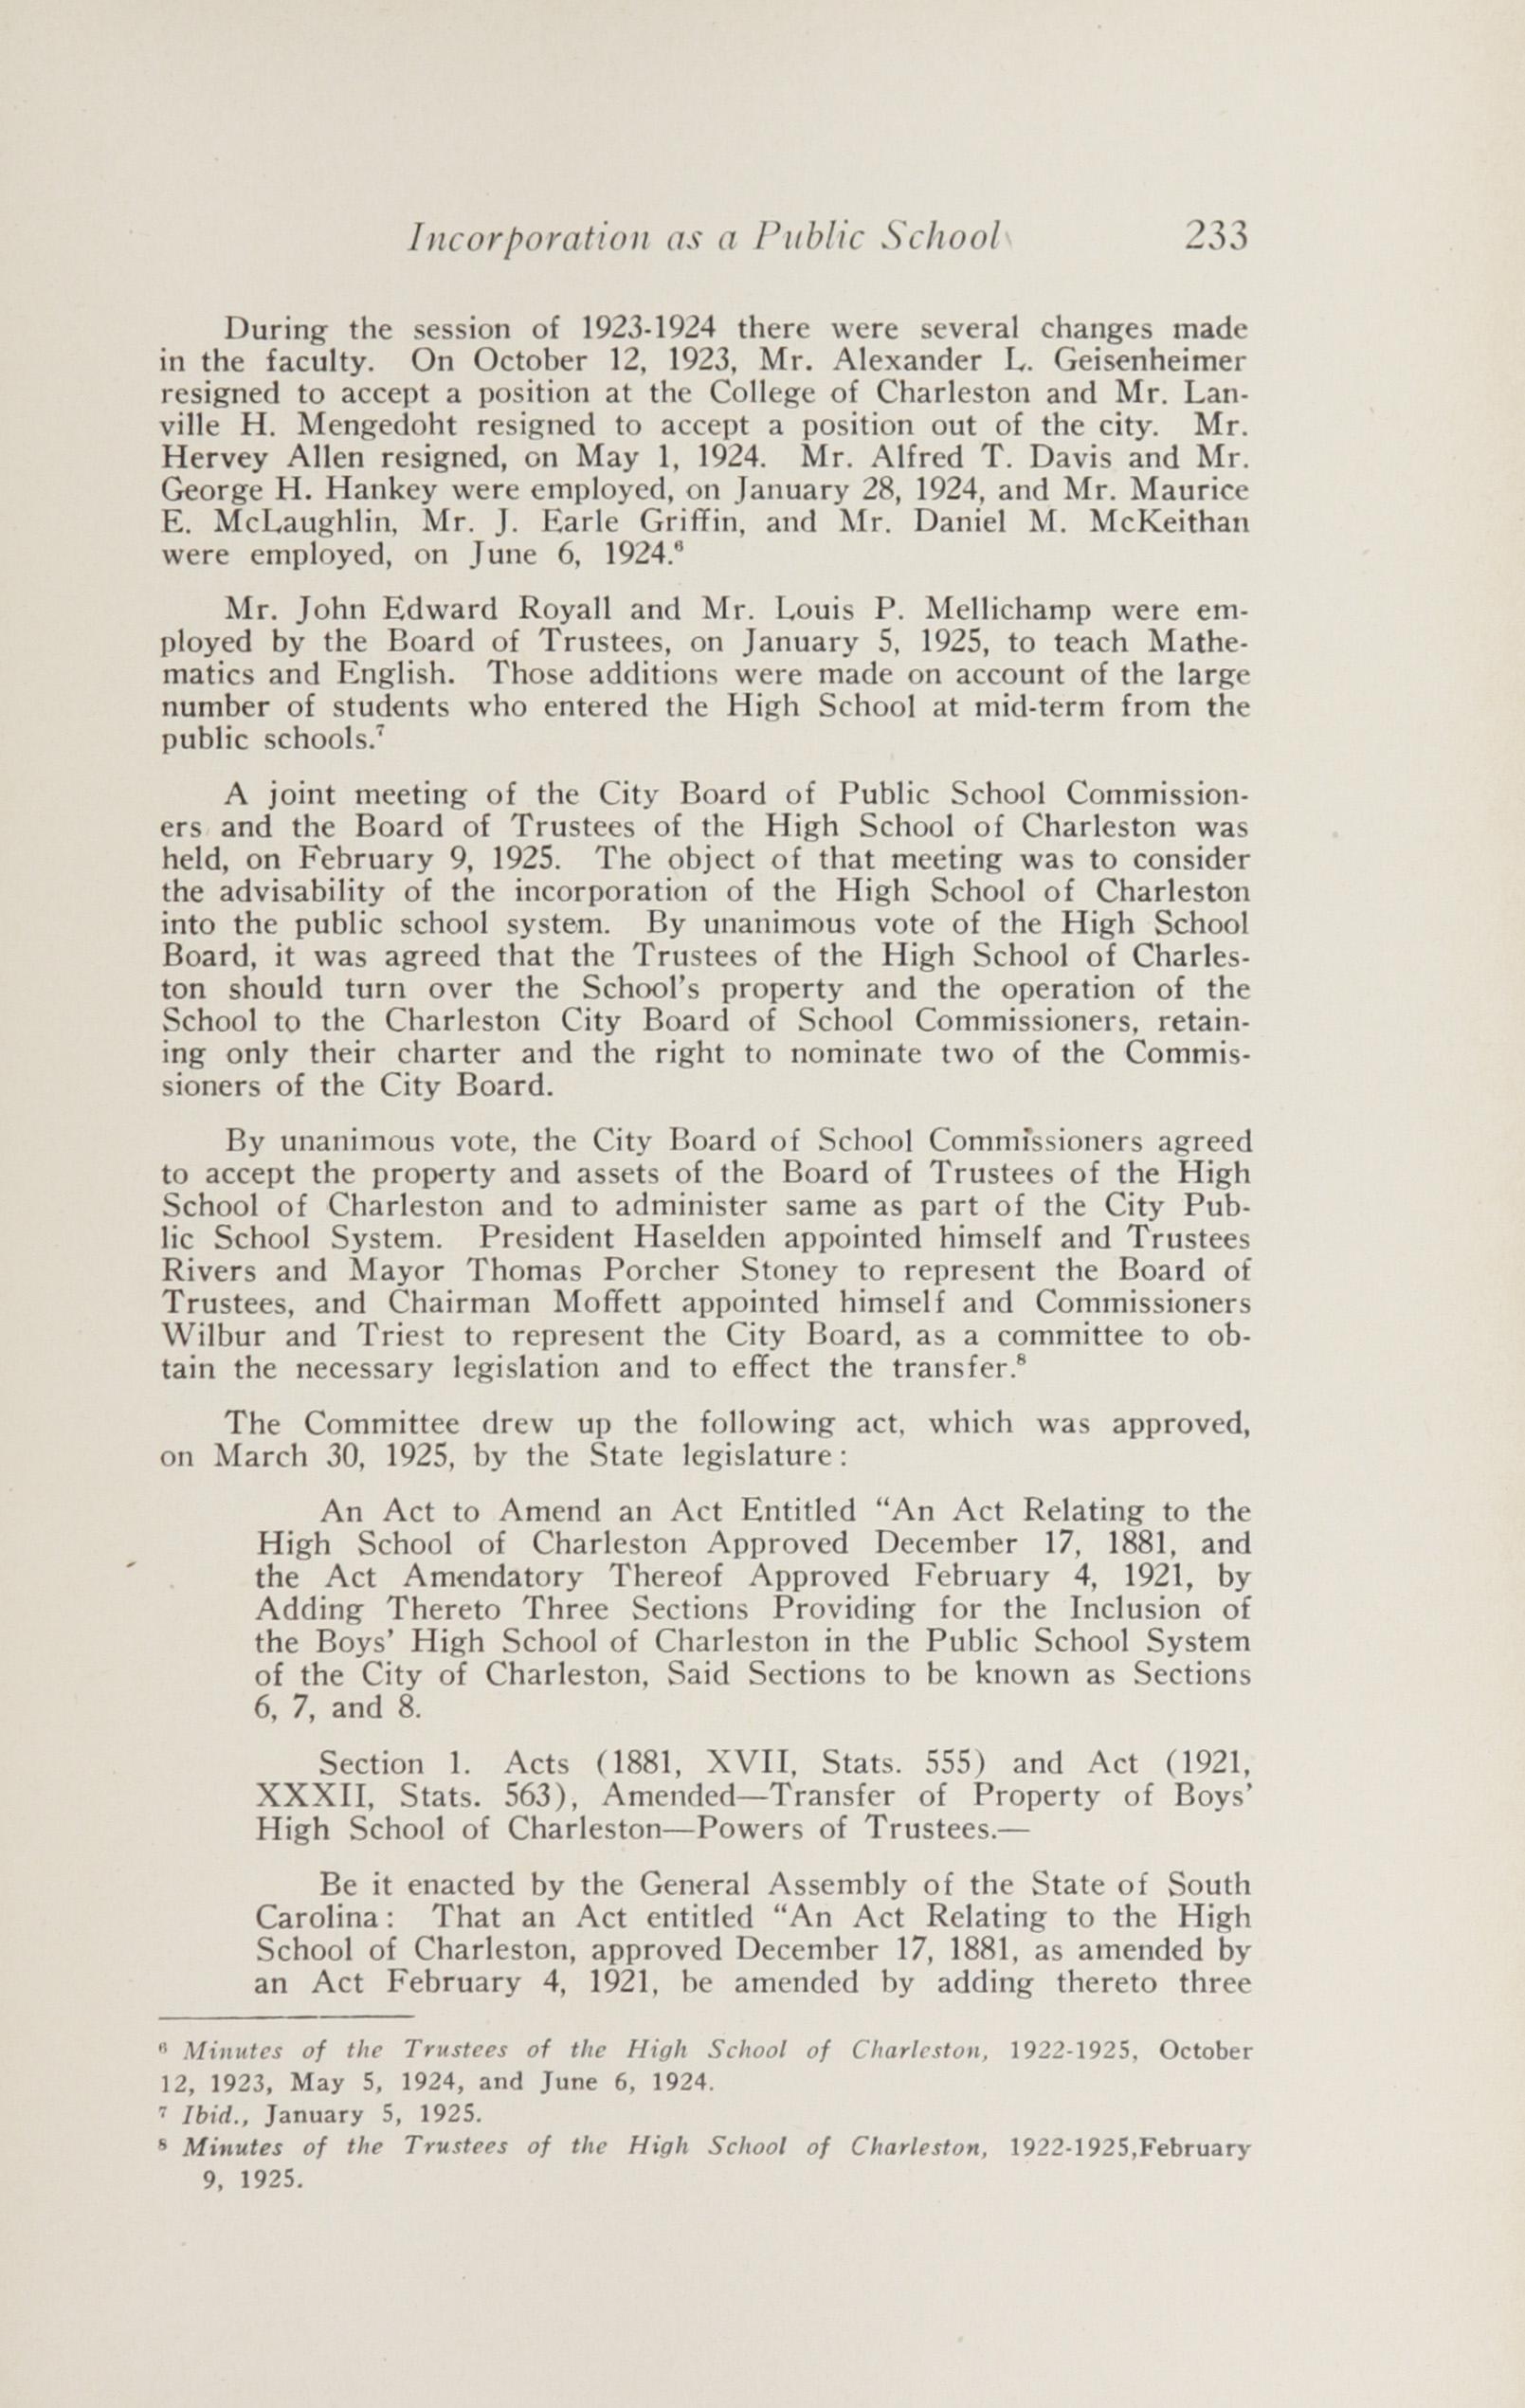 Charleston Yearbook, 1943, page 233